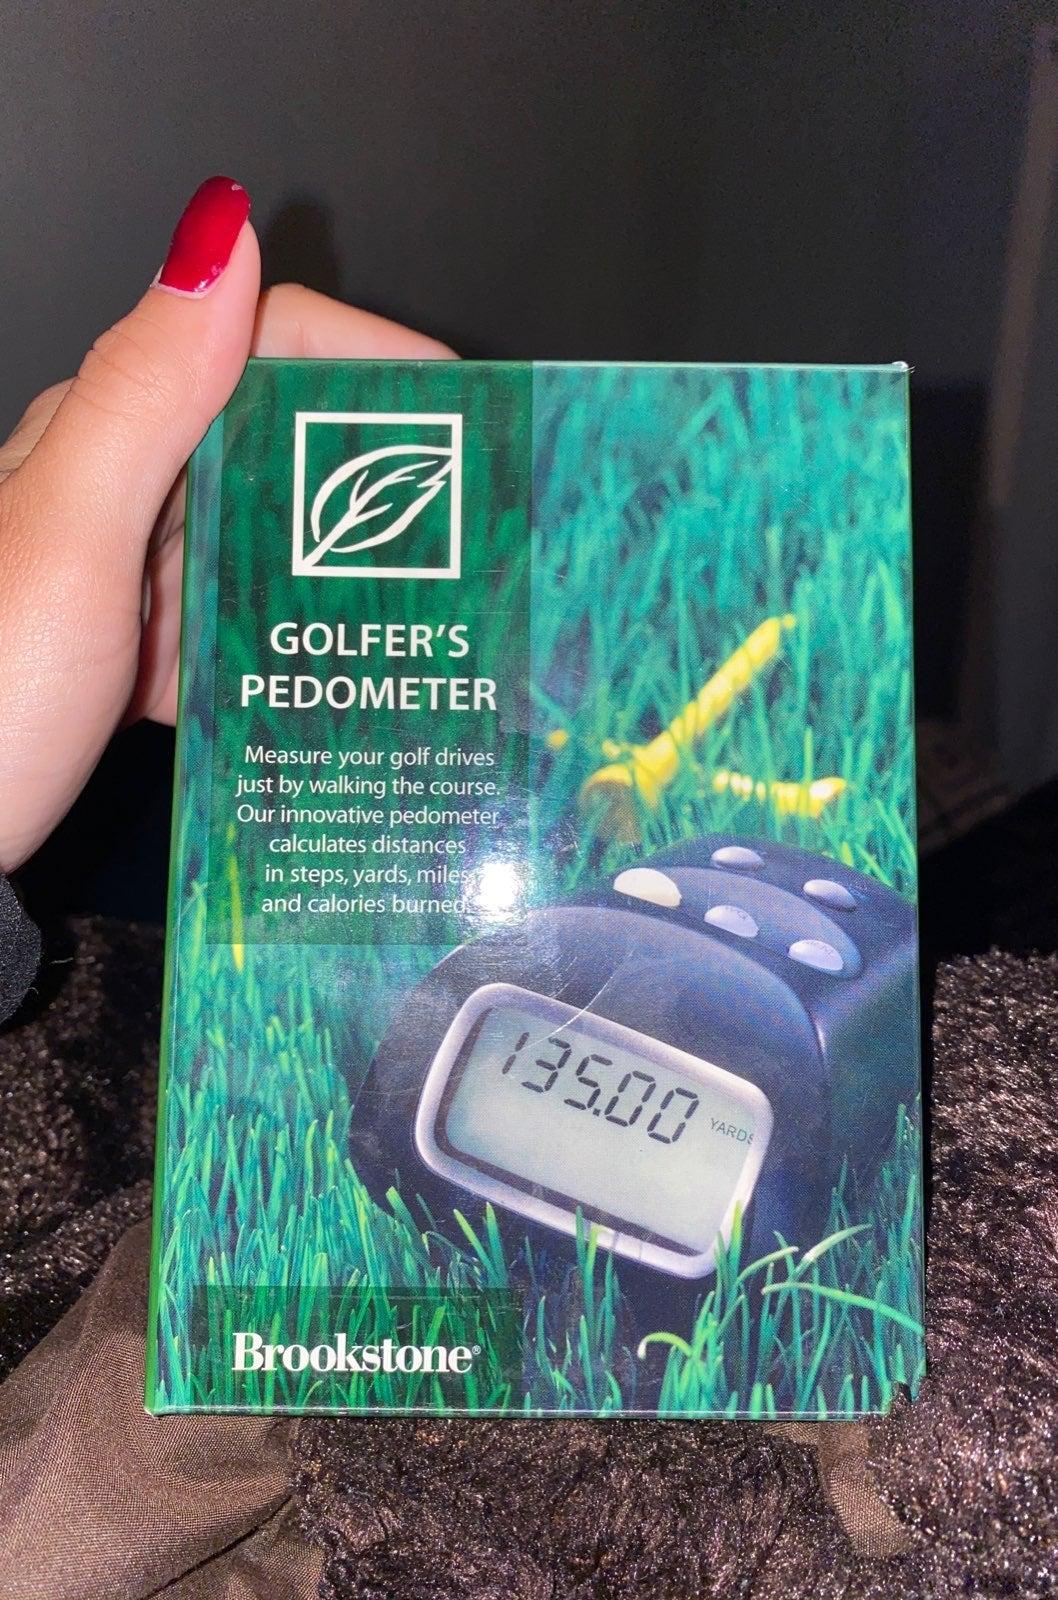 Golfers pedometer